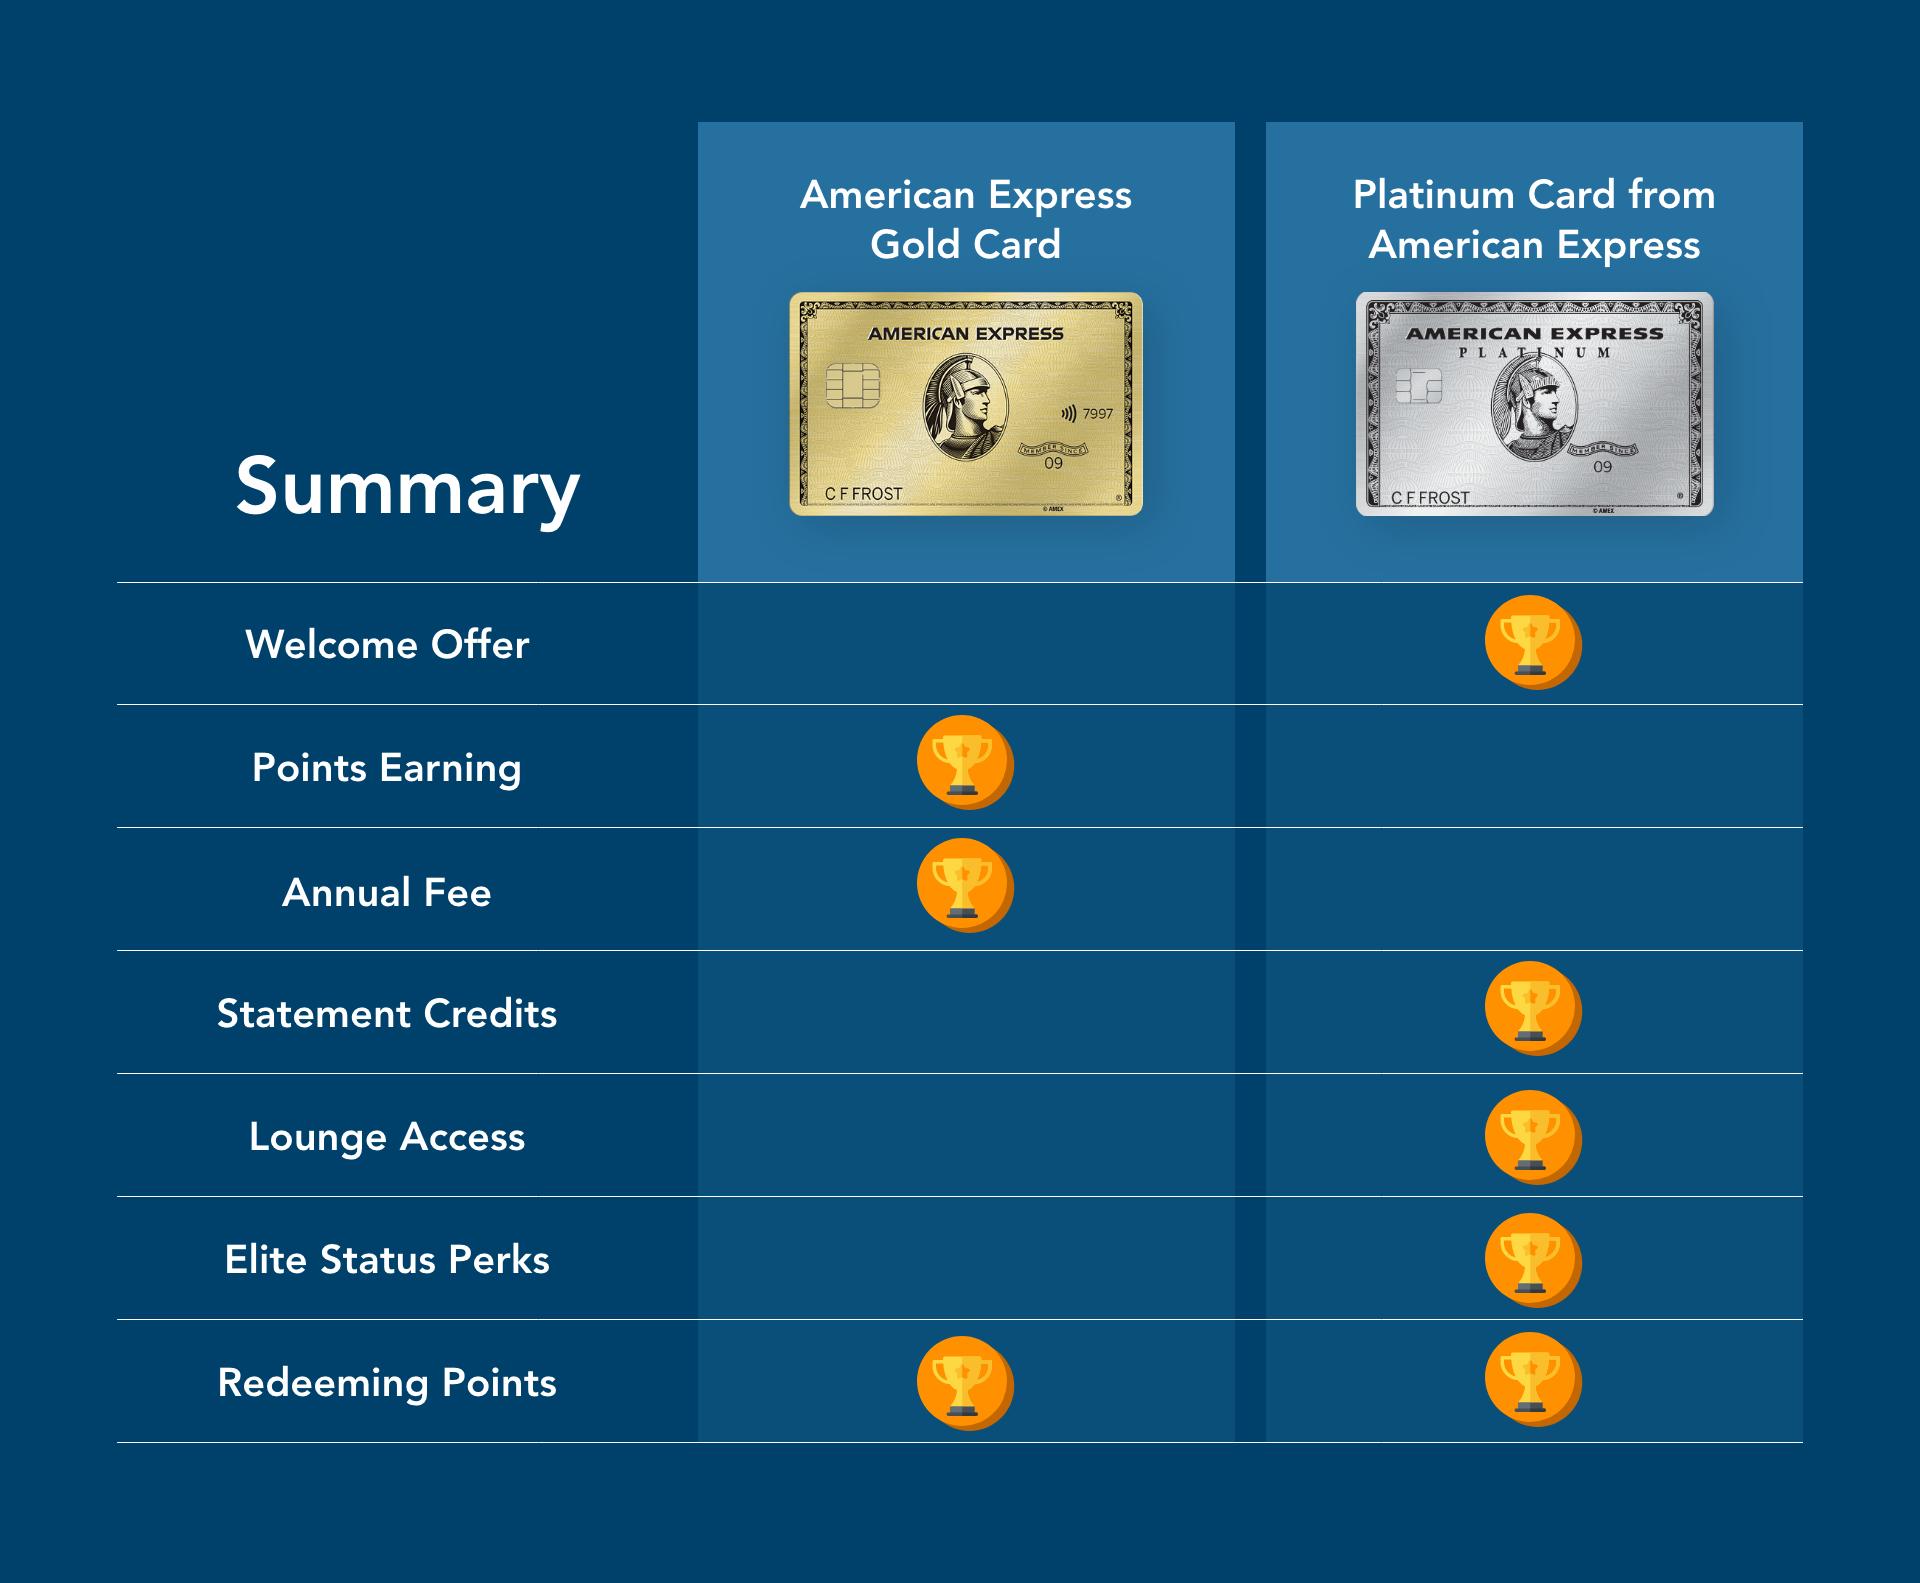 amex gold vs platinum final